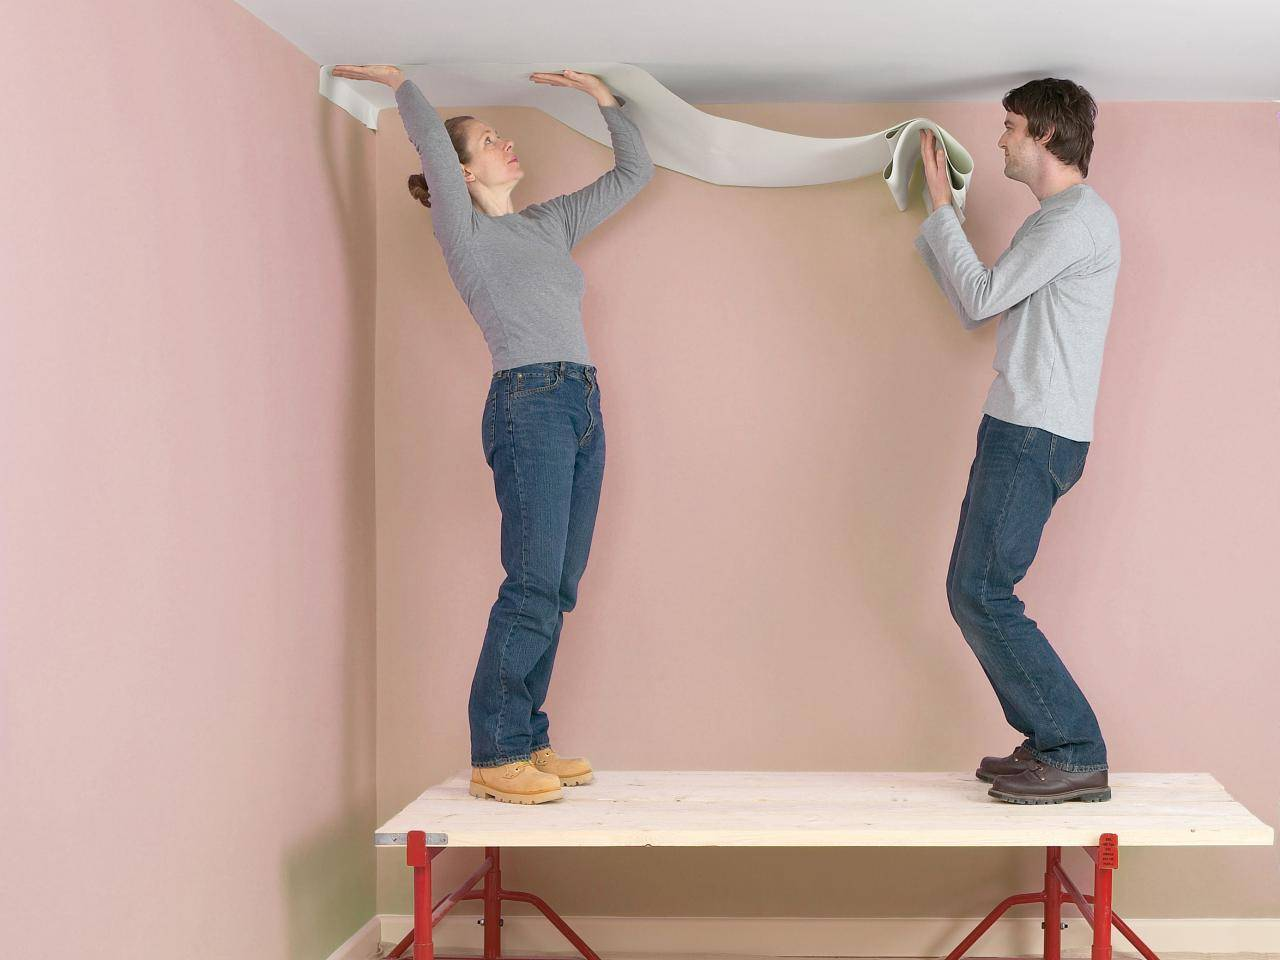 Стеклообои под покраску: оклейка и покраска своими руками